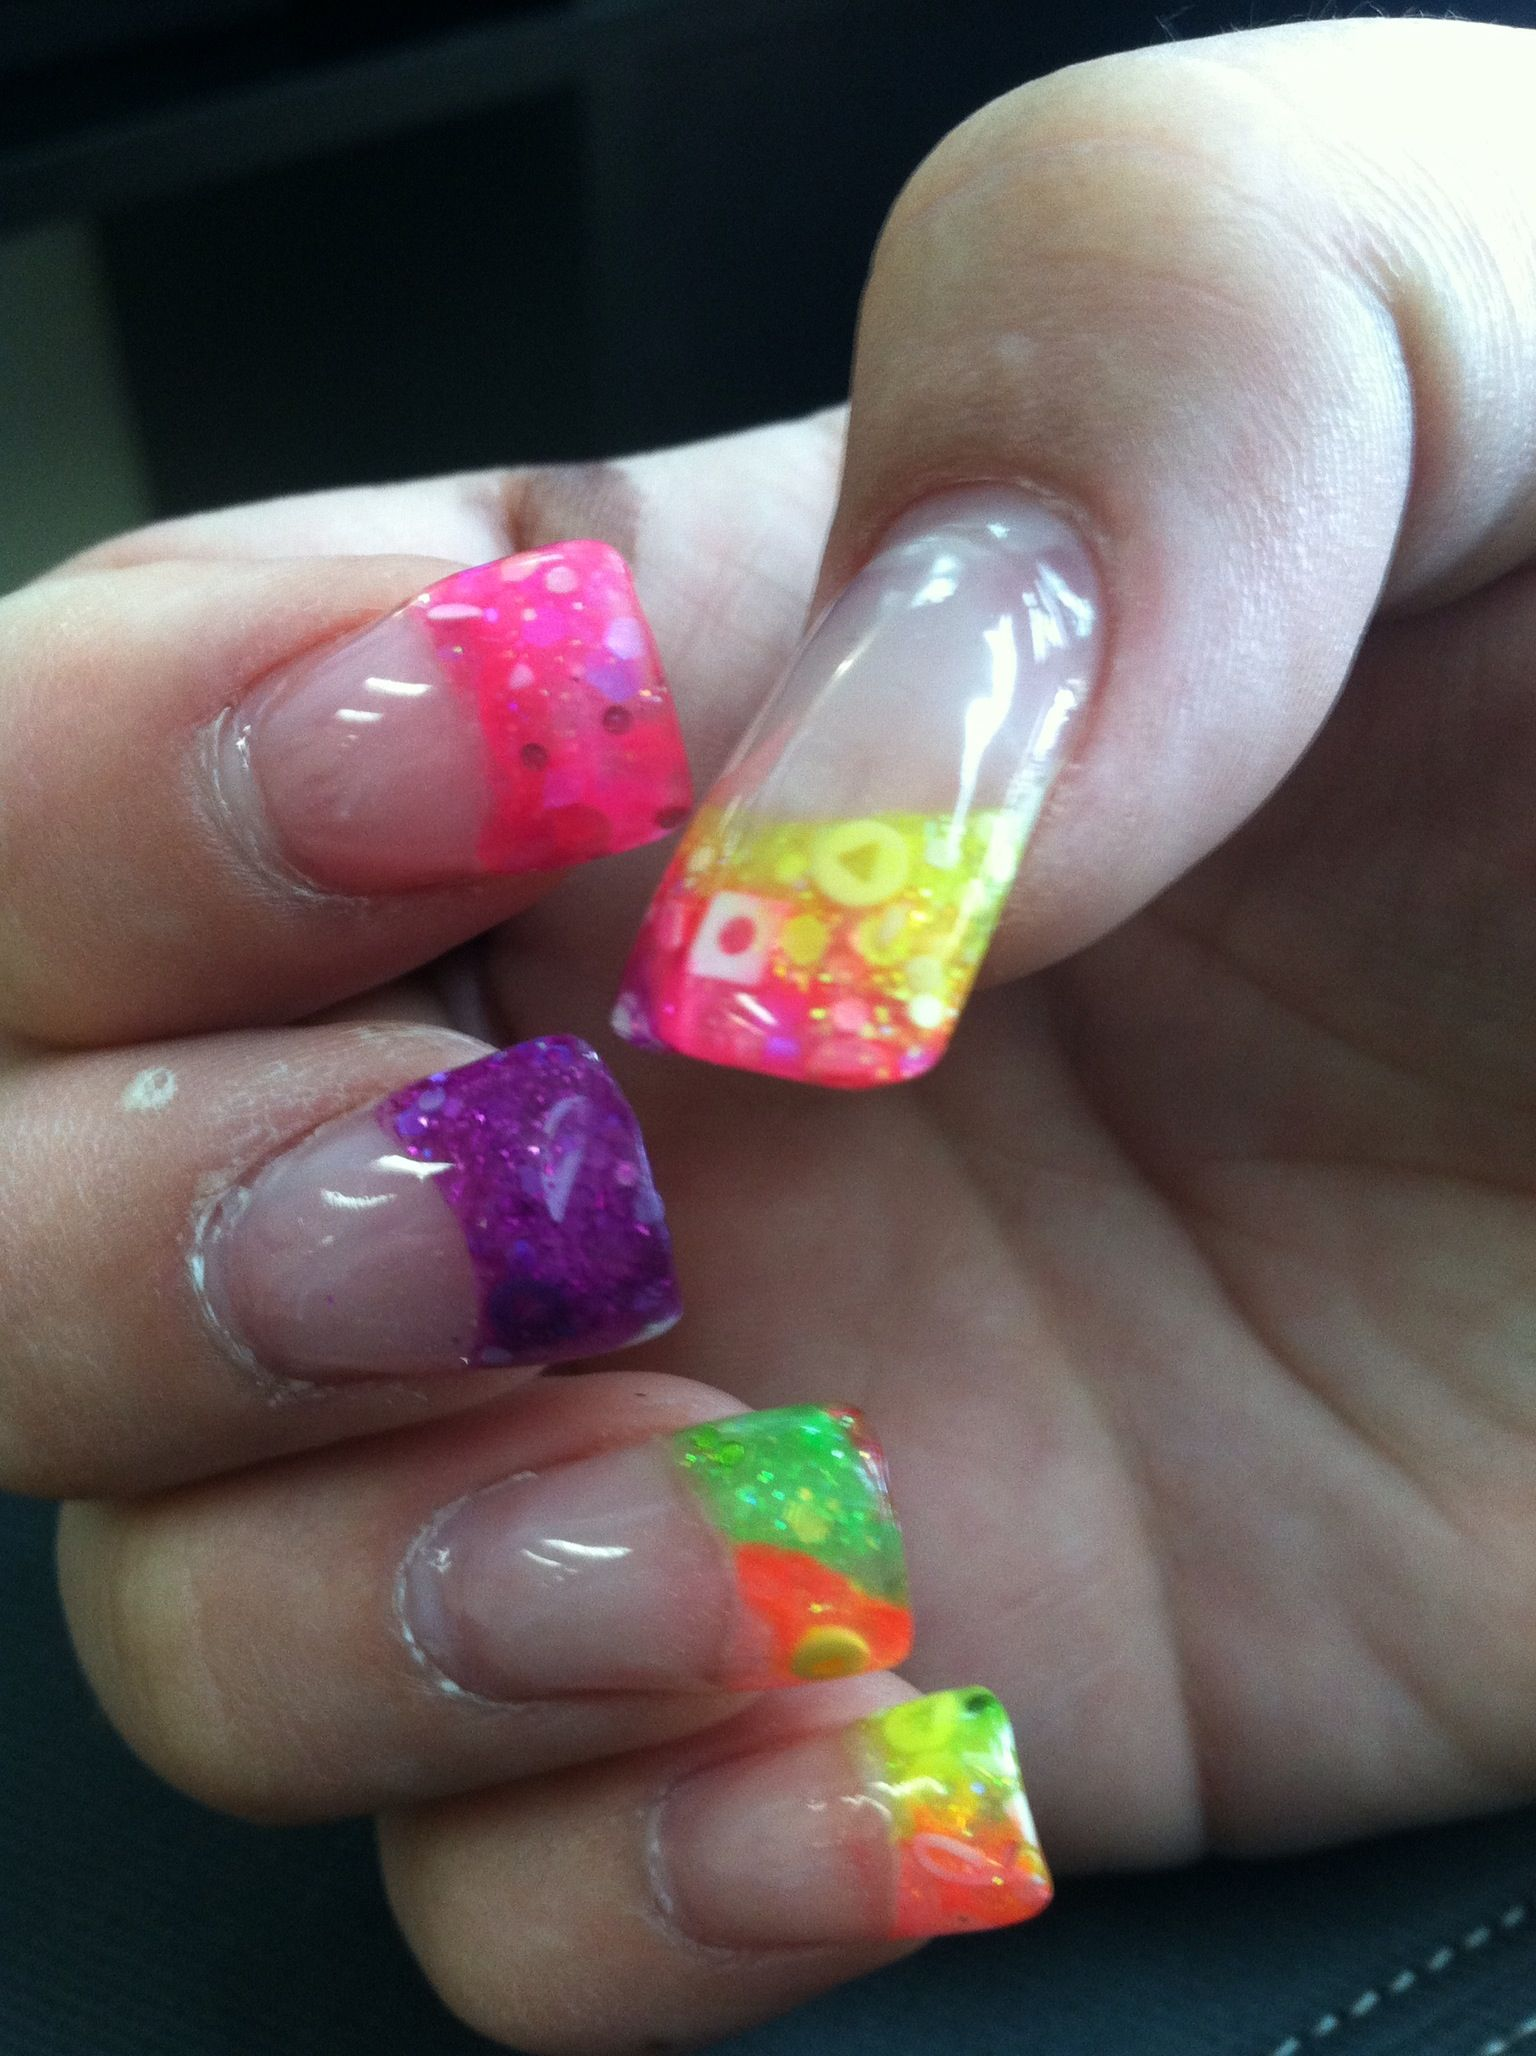 Organic nails sundance collection | Acrylic nails | Pinterest ...